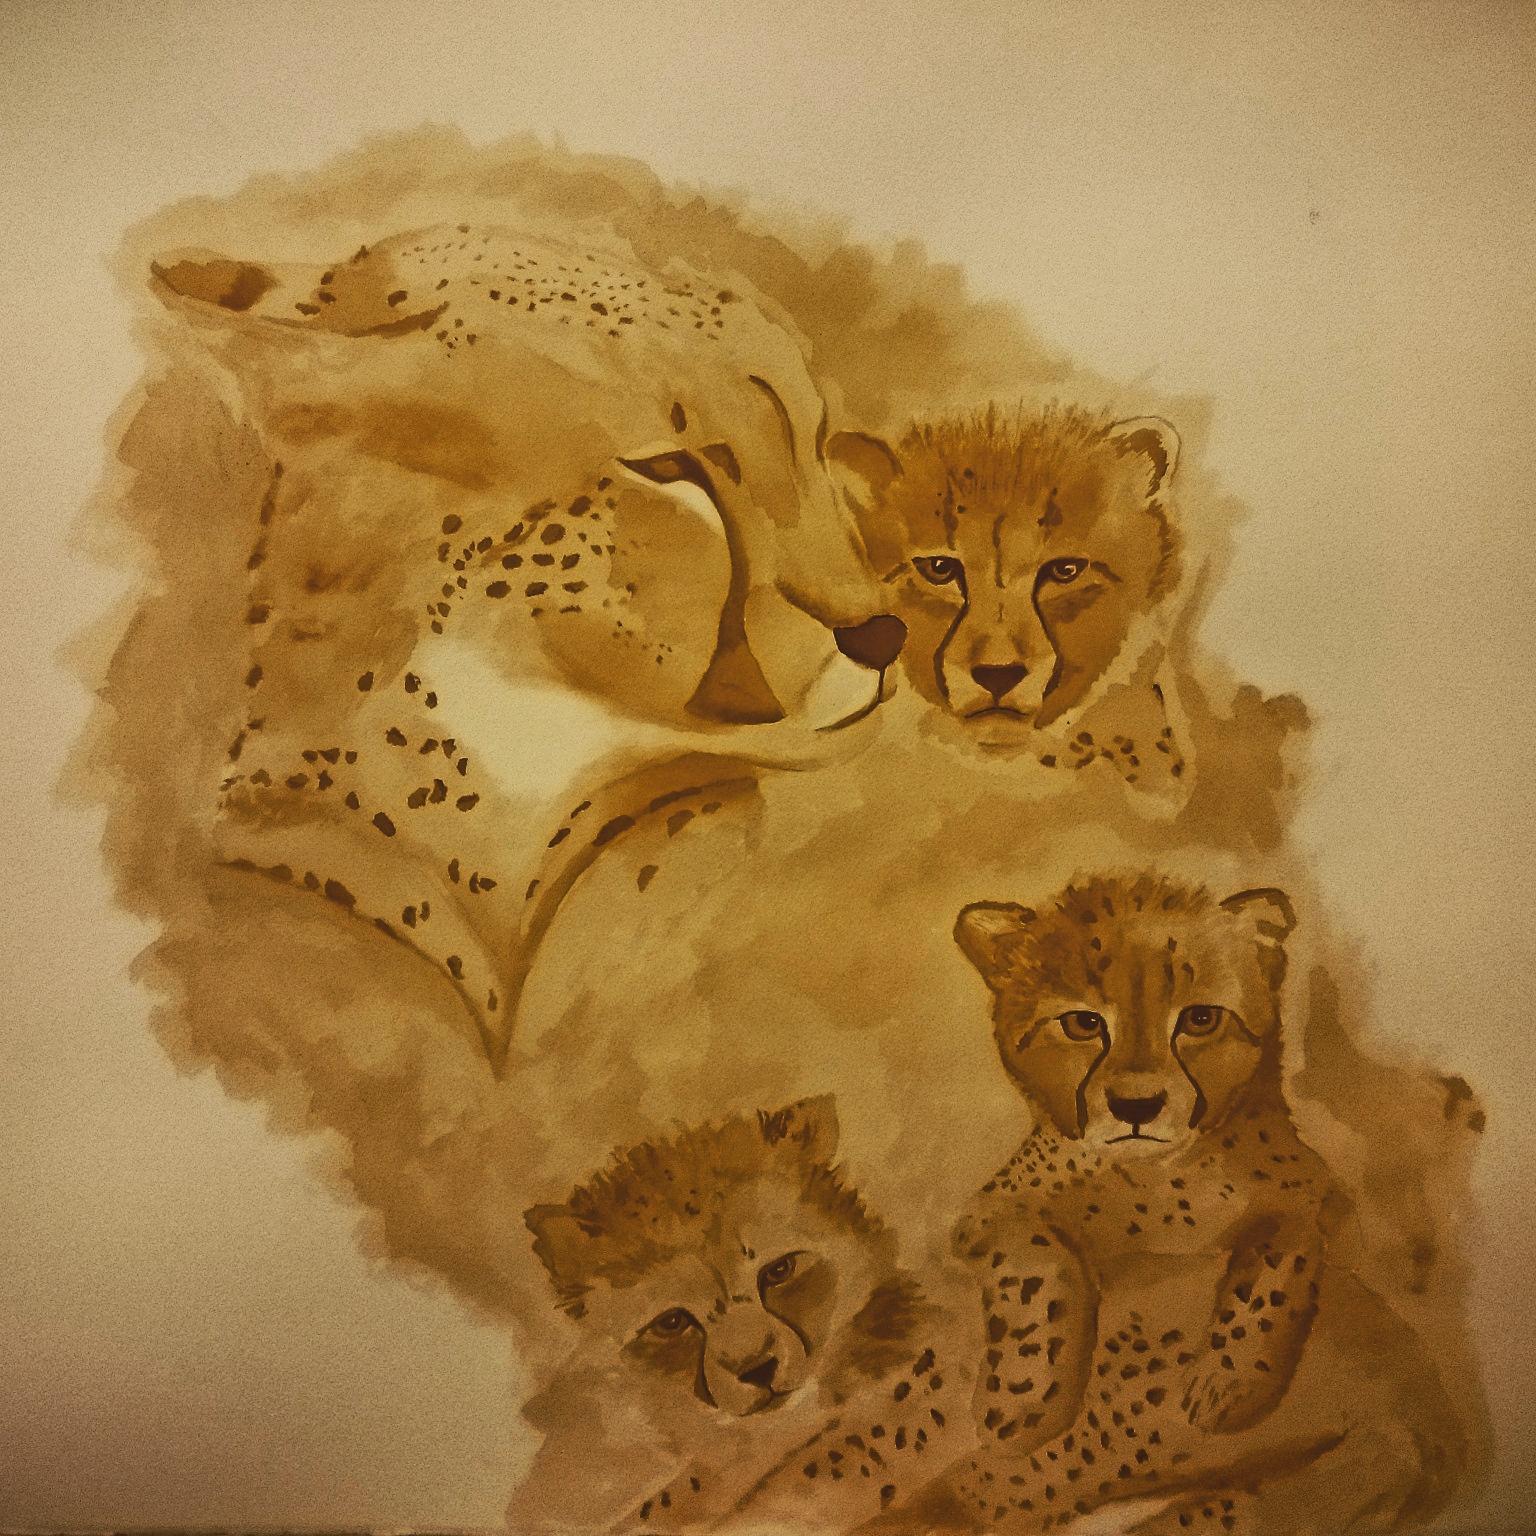 Cheetah Family (2015)